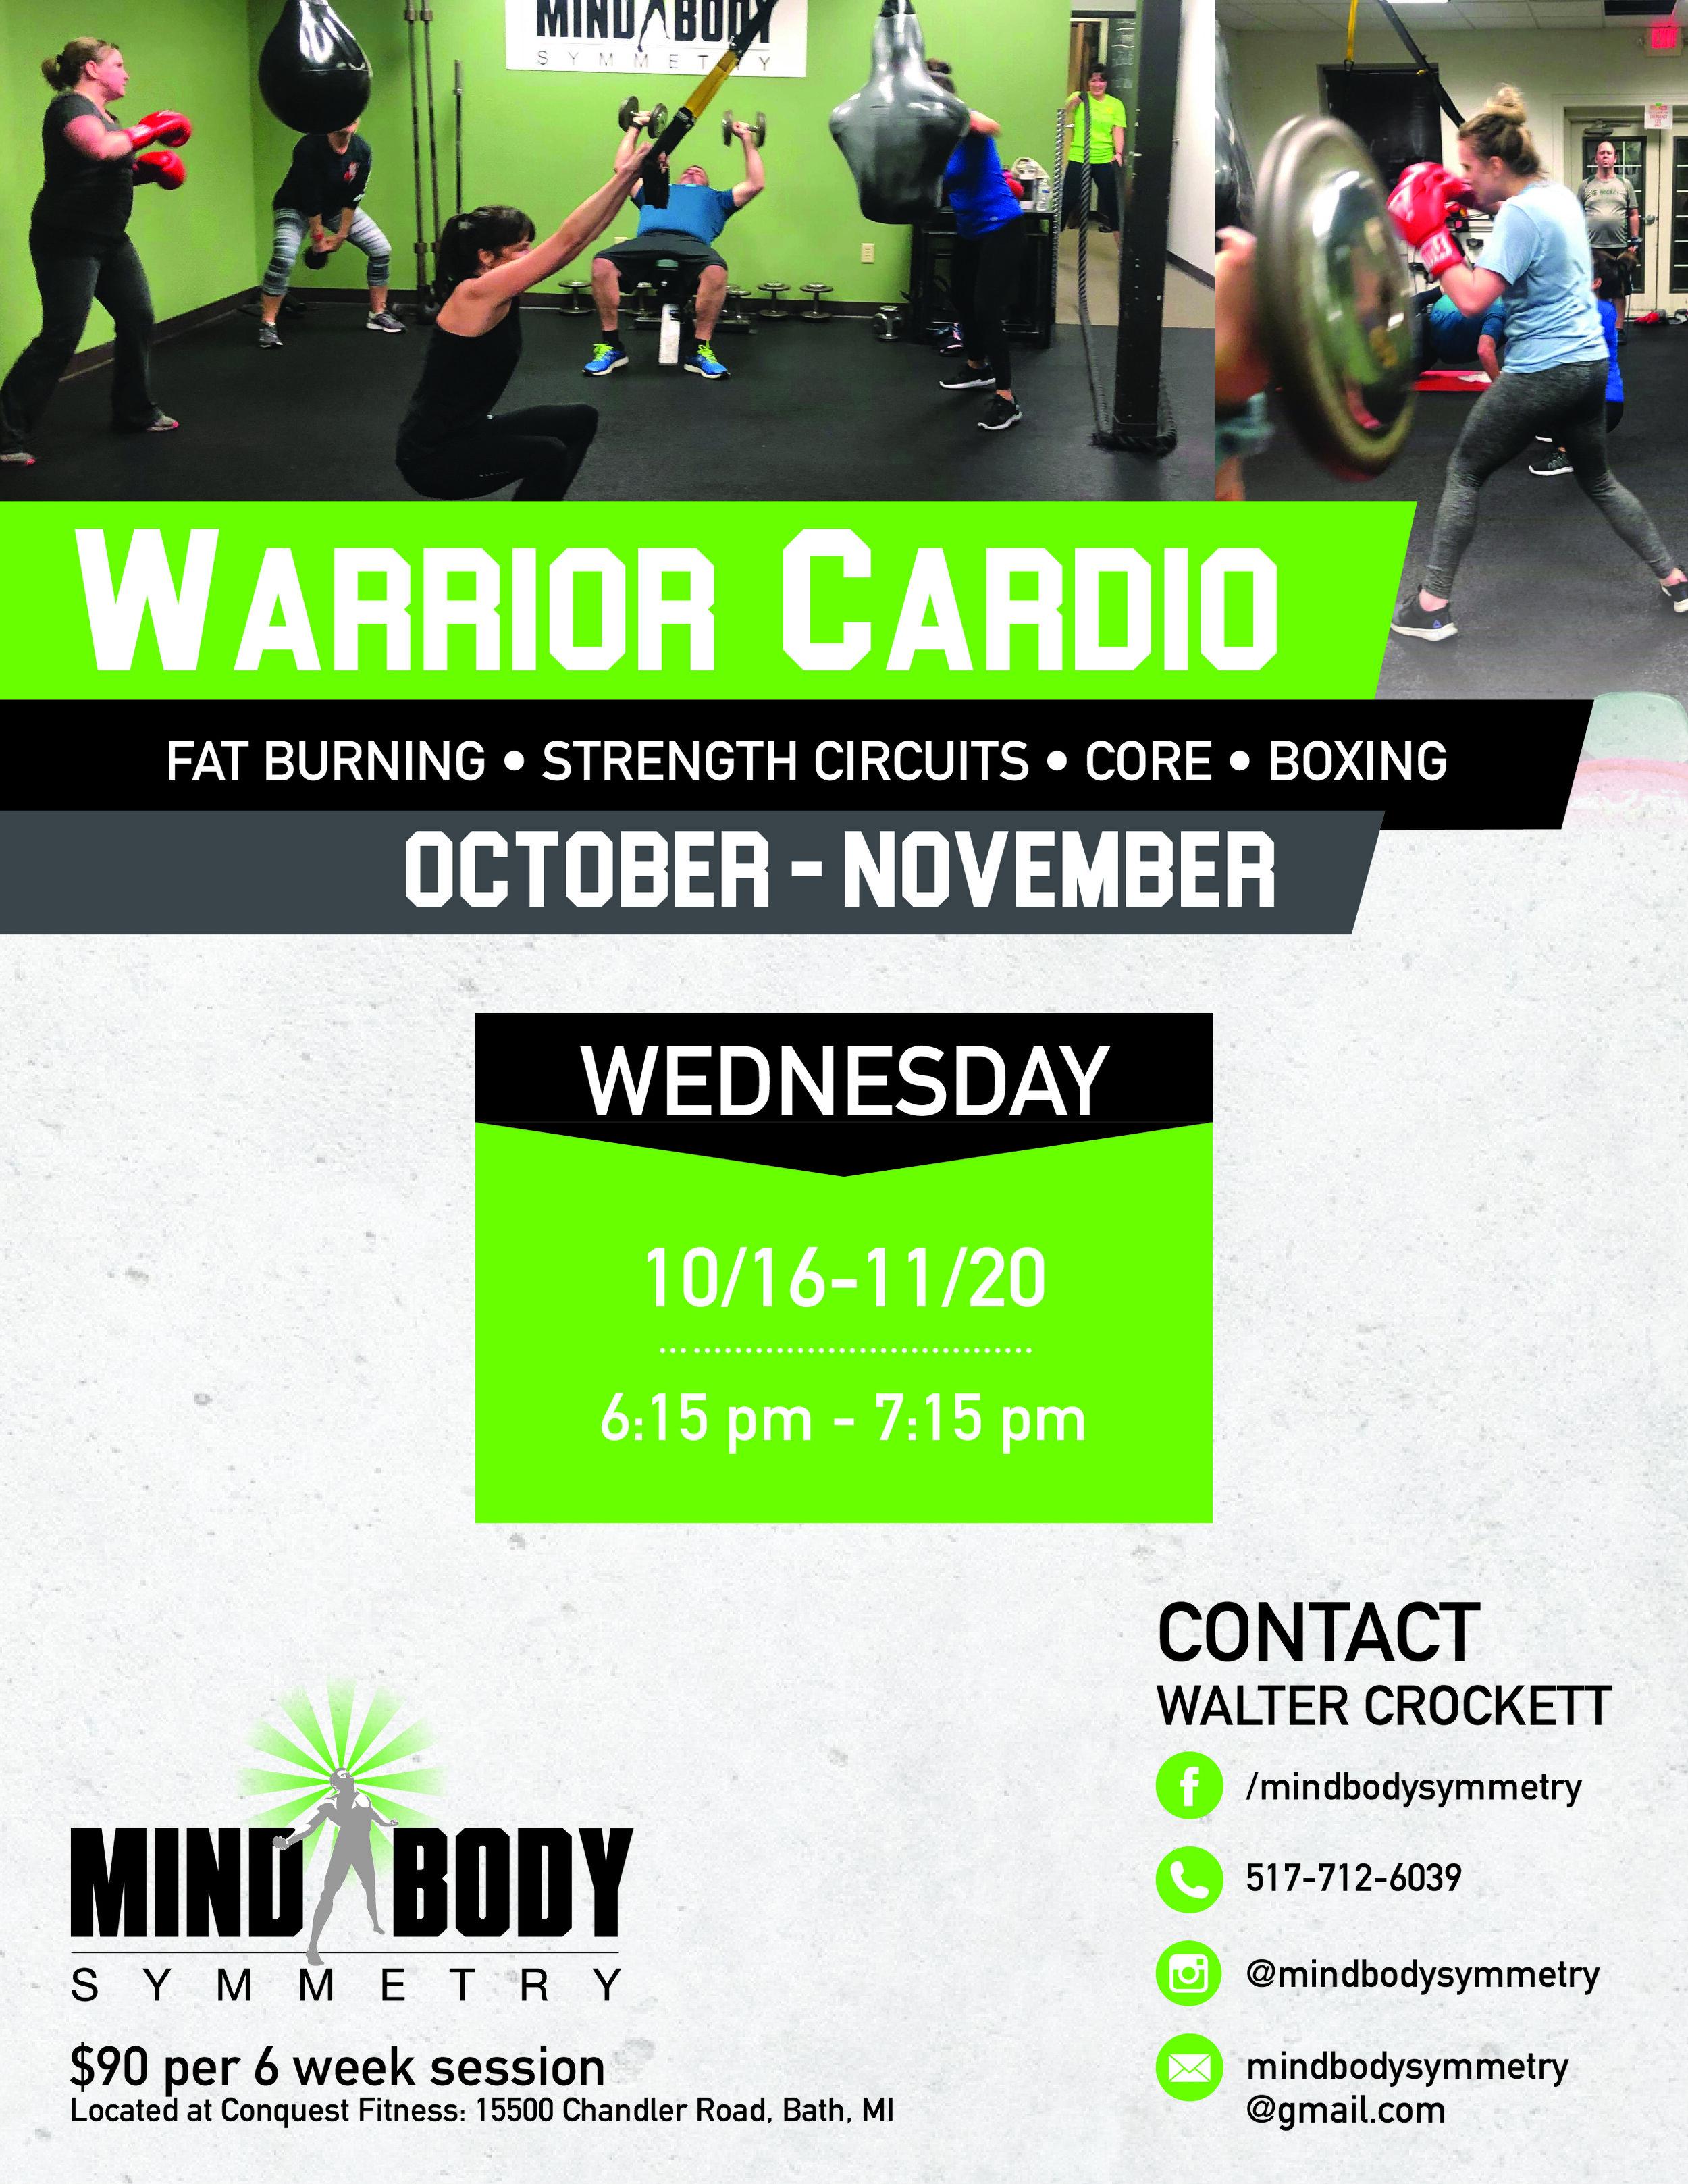 Warrior Cardio-01octnov19.jpg